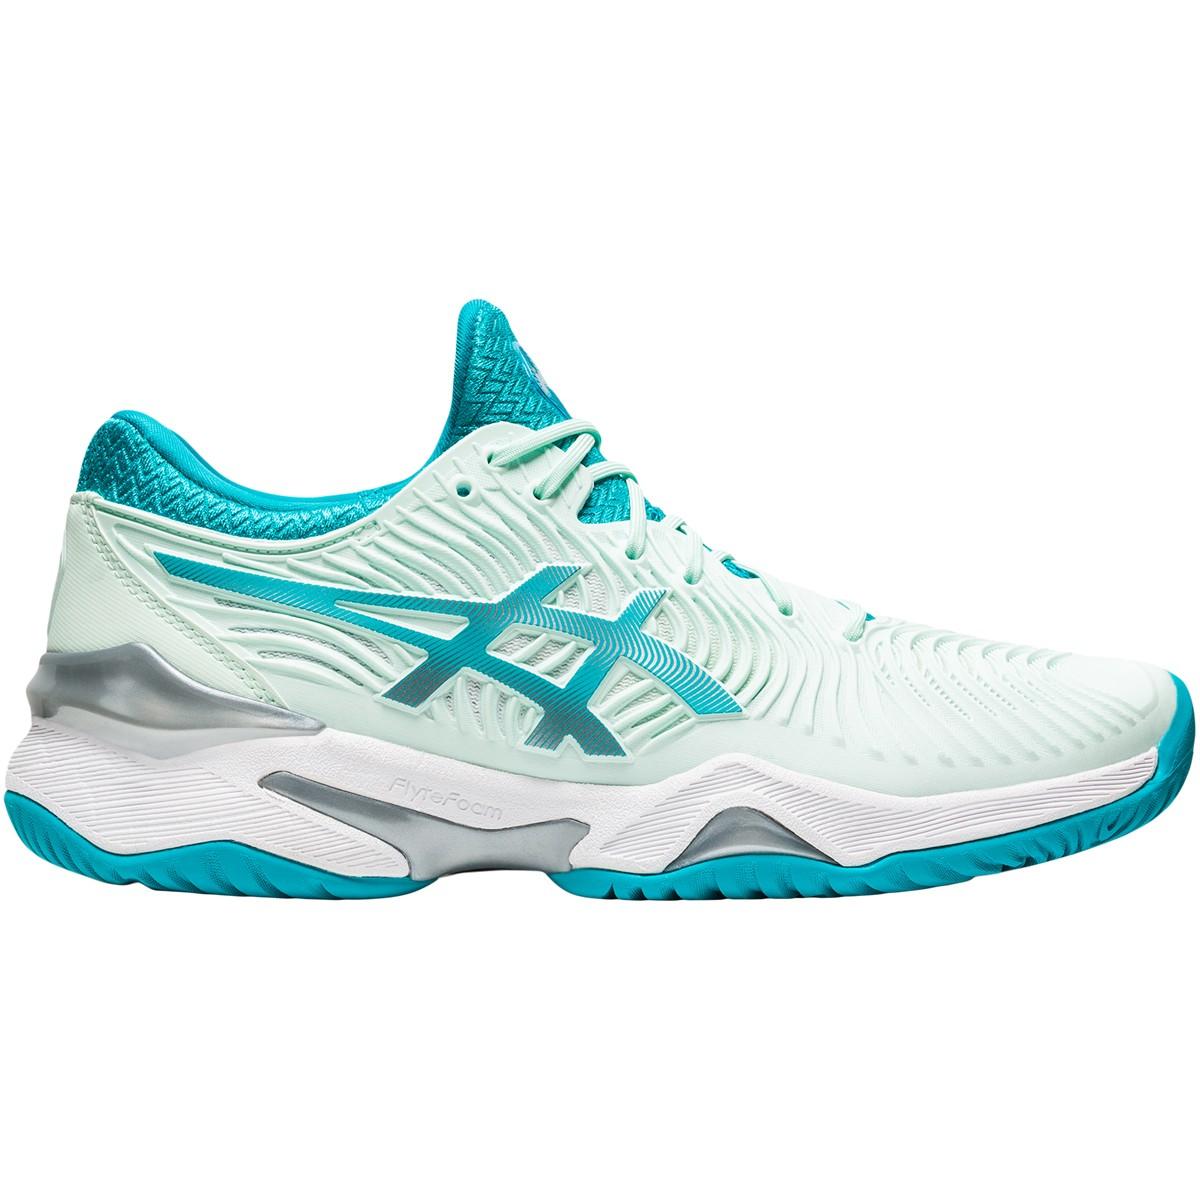 Familiarizarse seno Maldición  WOMEN'S ASICS COURT FF ALL COURT SHOES - ASICS - Women's - Shoes | Tennispro